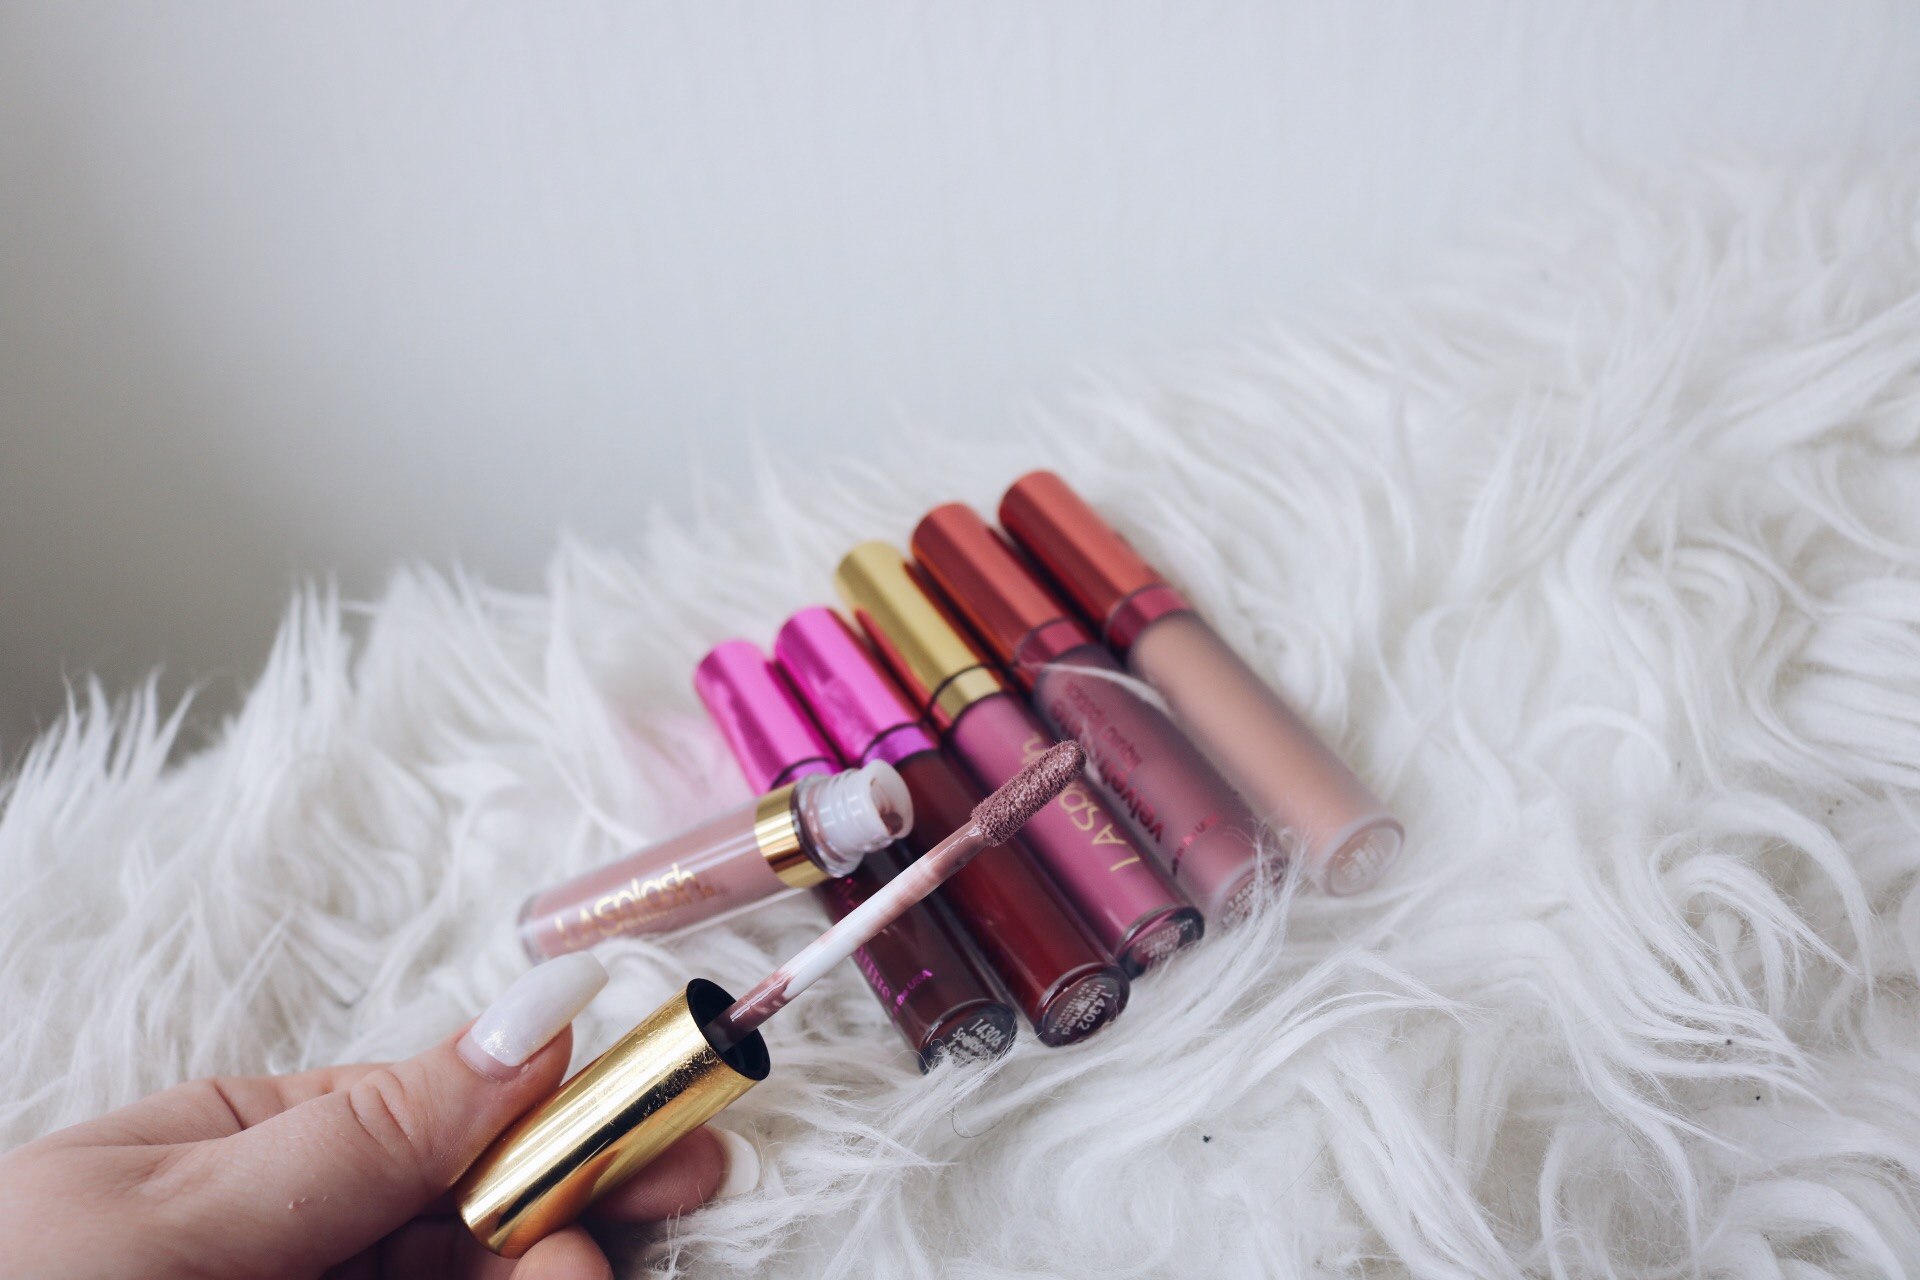 LA Splash flytande läppstift pressutskick amandahans skönhetsblogg matta läppstift kylie jenner swatches